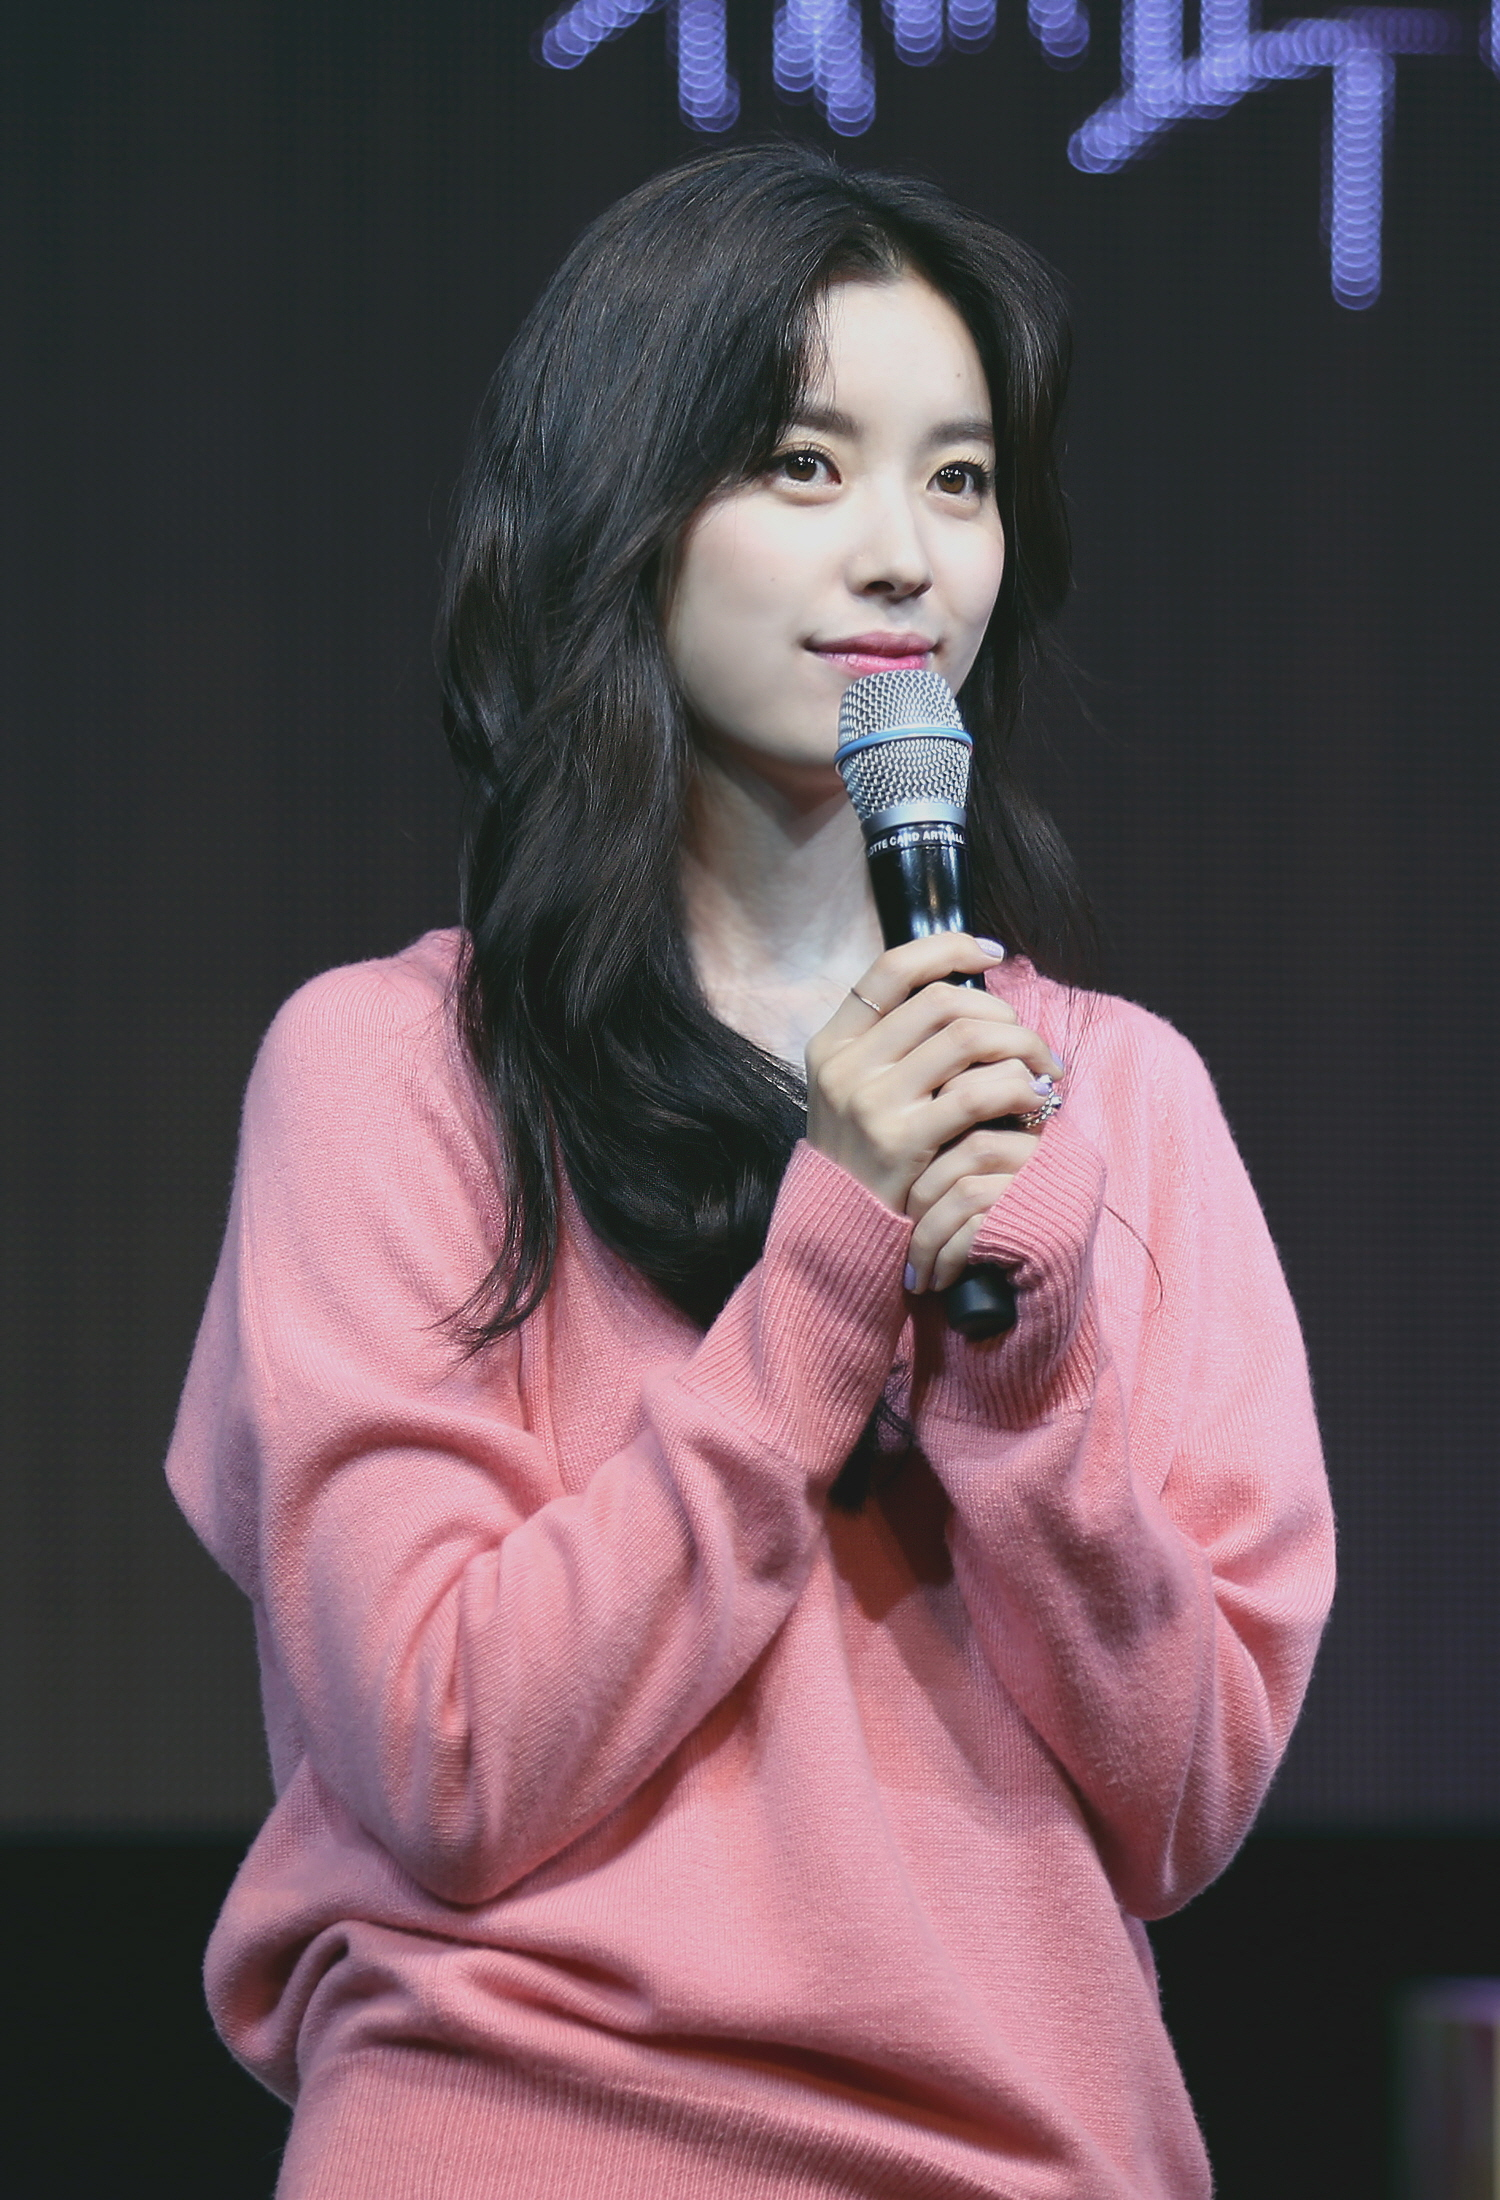 Moon Chae vann dating Joo vann